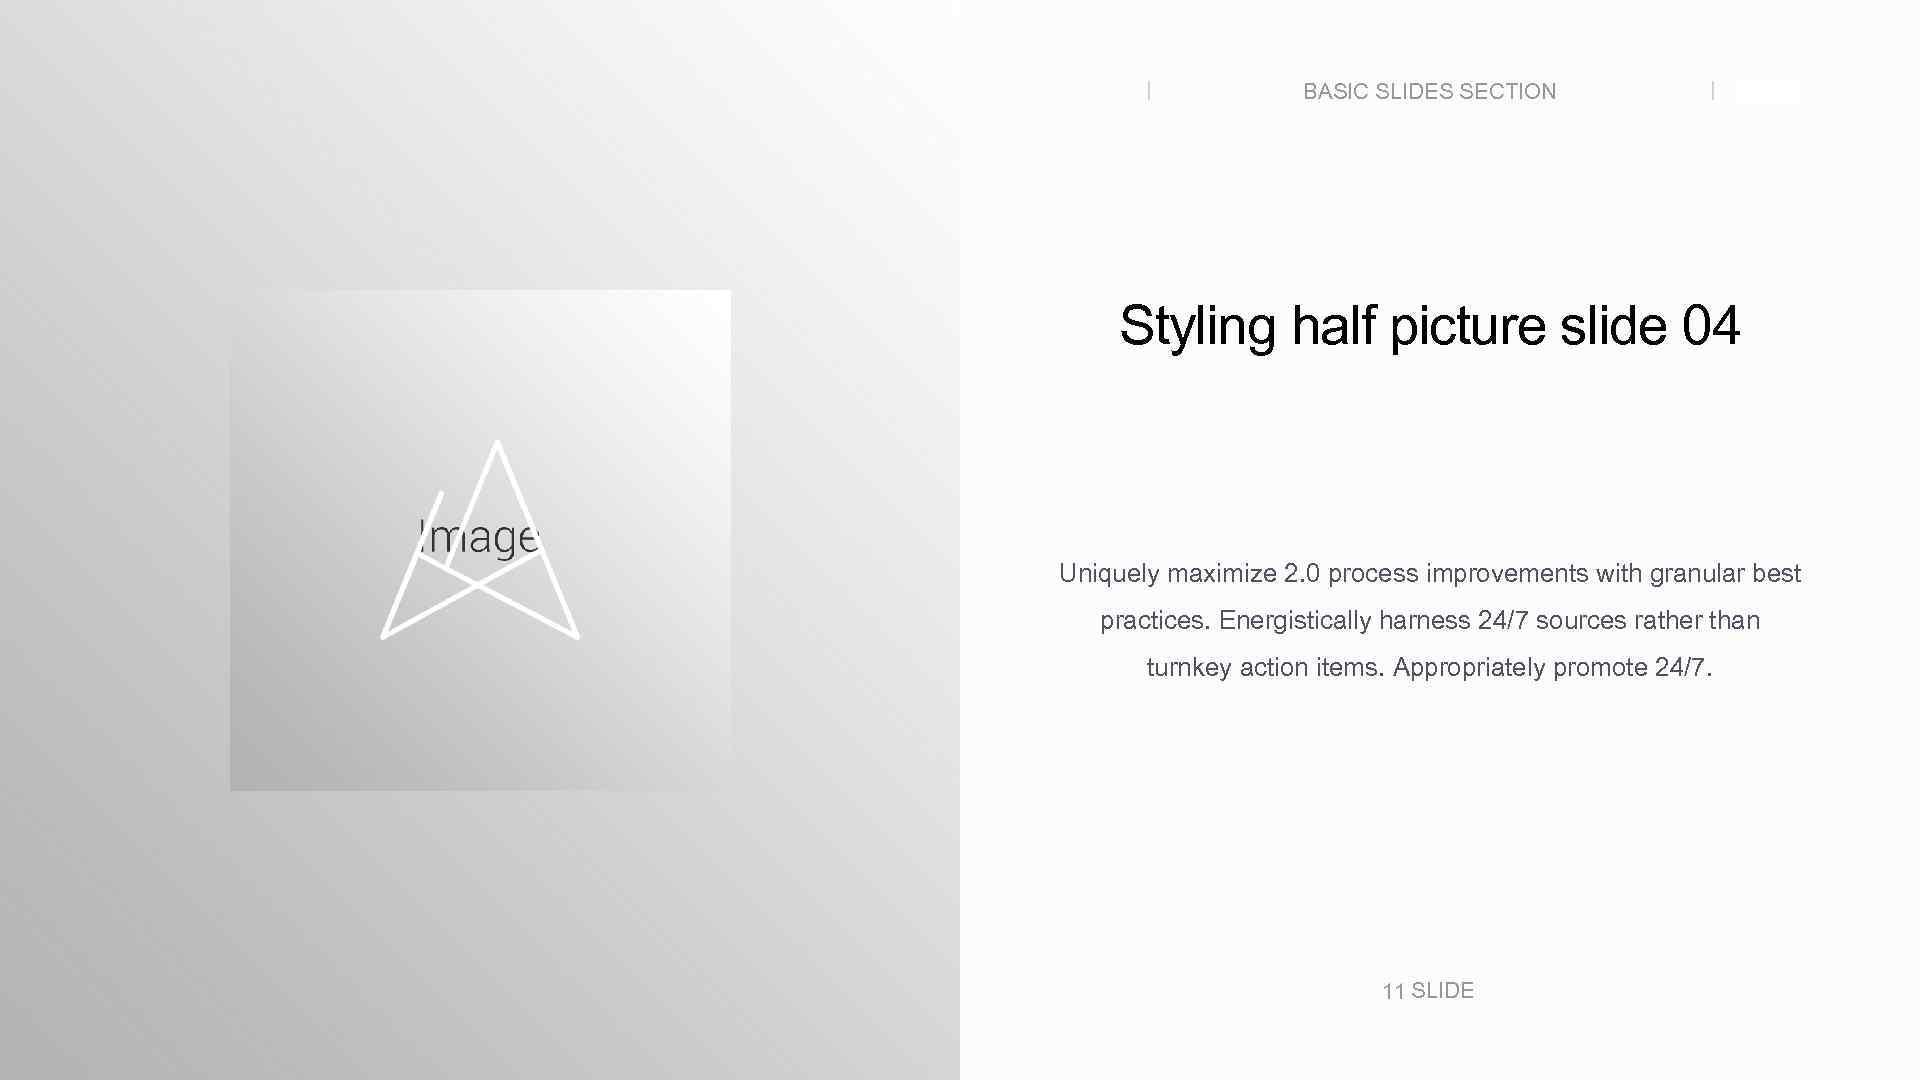 BASIC SLIDES SECTION SLIDE Styling half picture slide 04 Uniquely maximize 2. 0 process